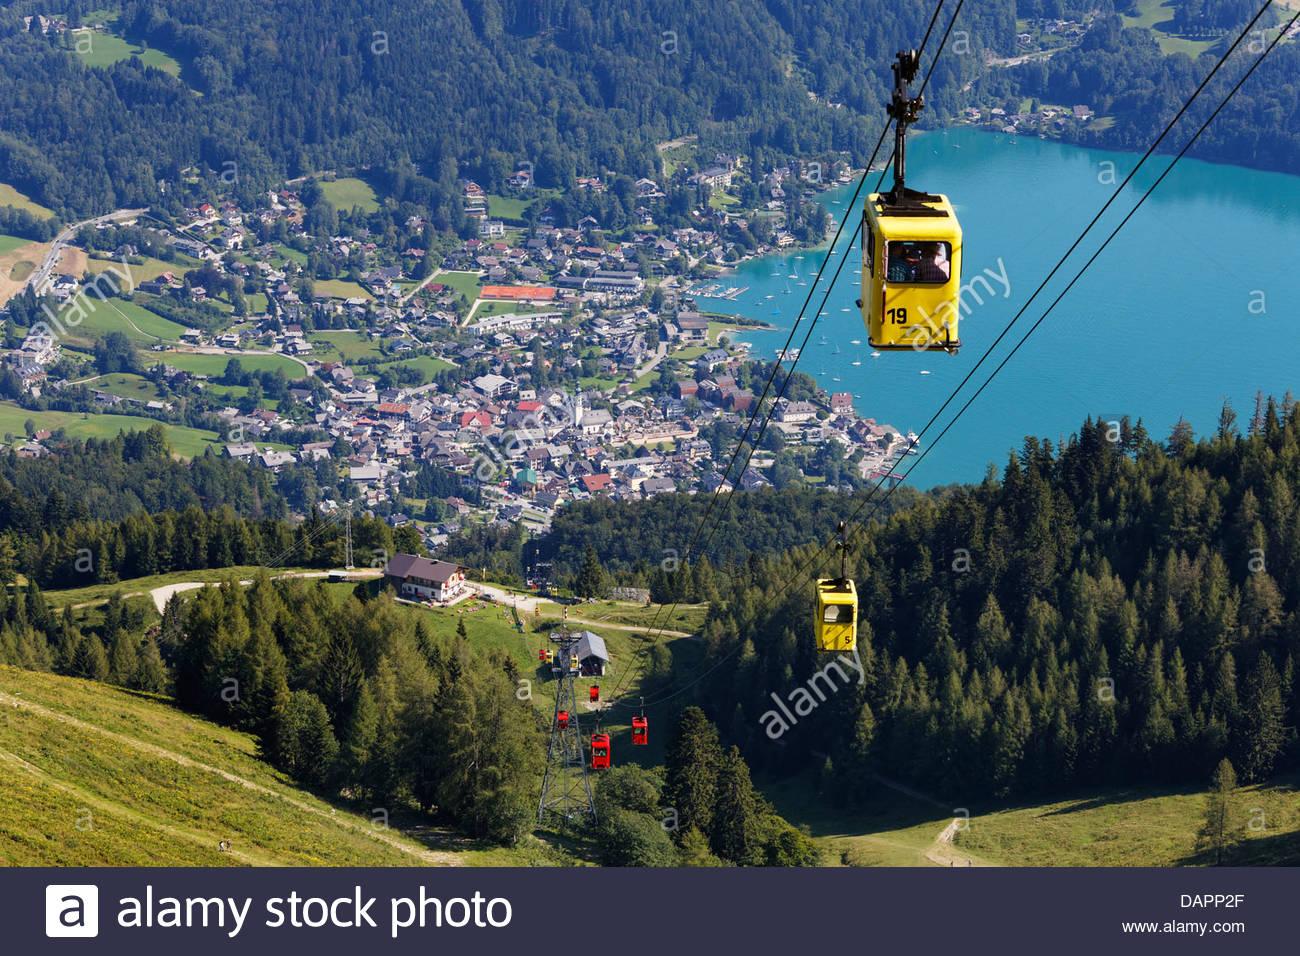 Austria salzkammergut zwolferhorn cable car at st gilgen stock austria salzkammergut zwolferhorn cable car at st gilgen sciox Images